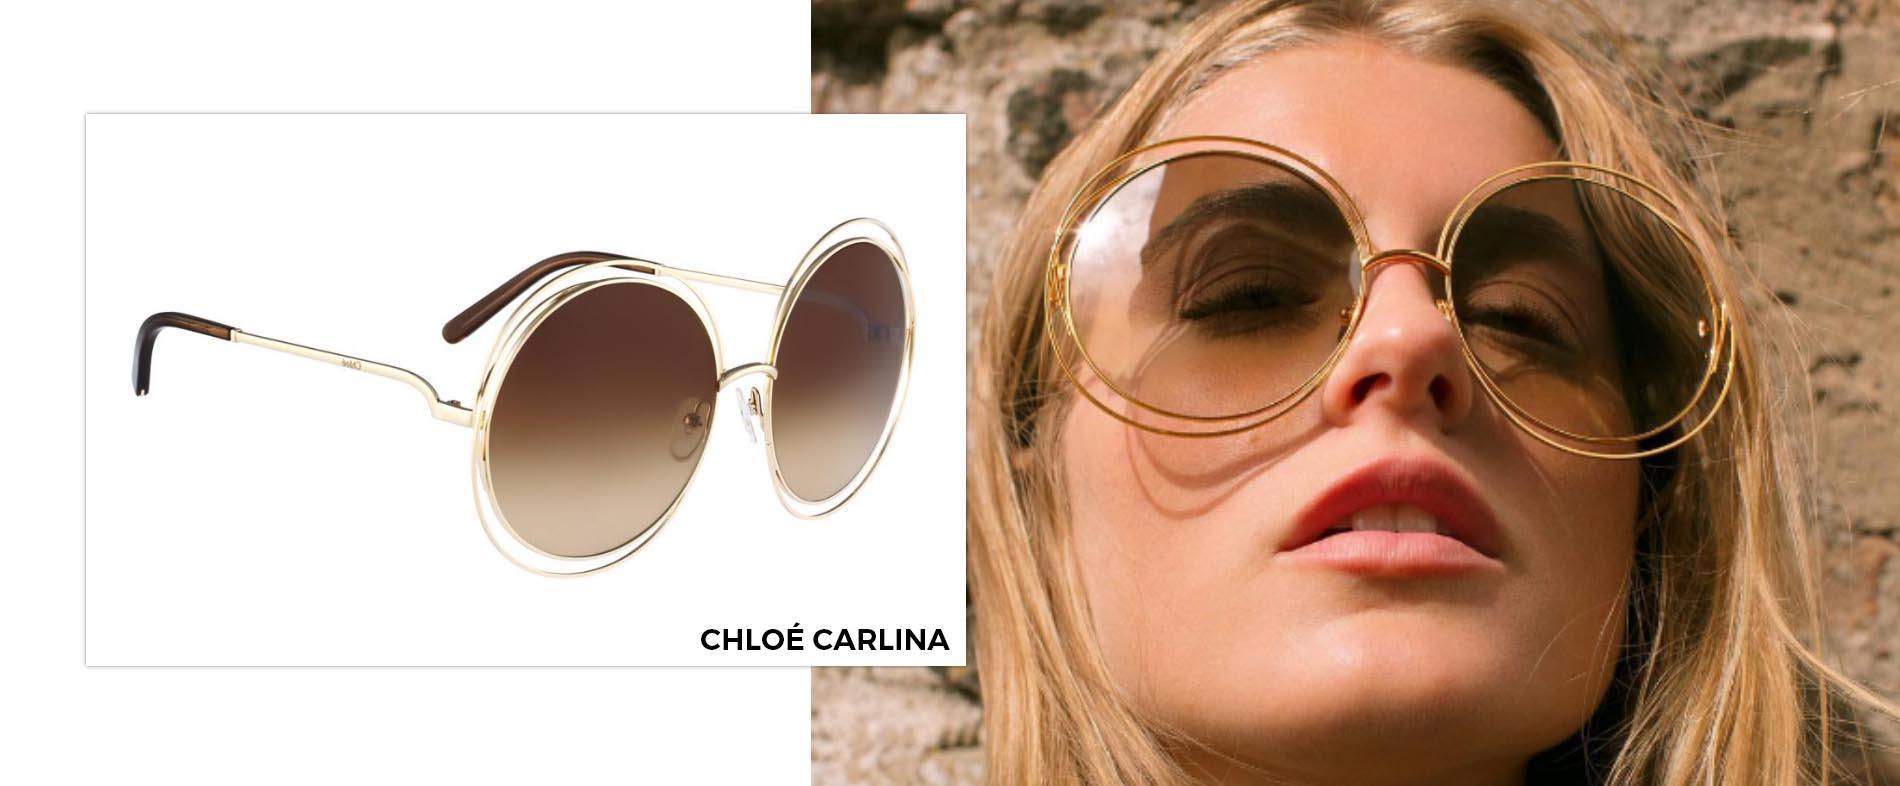 e69d4c075c6 Chloé Carlina CE114S 784 6218 Sunglasses €309.42 €243.98 · Chloé Carlina  Squared CE119S 786 6018 ...